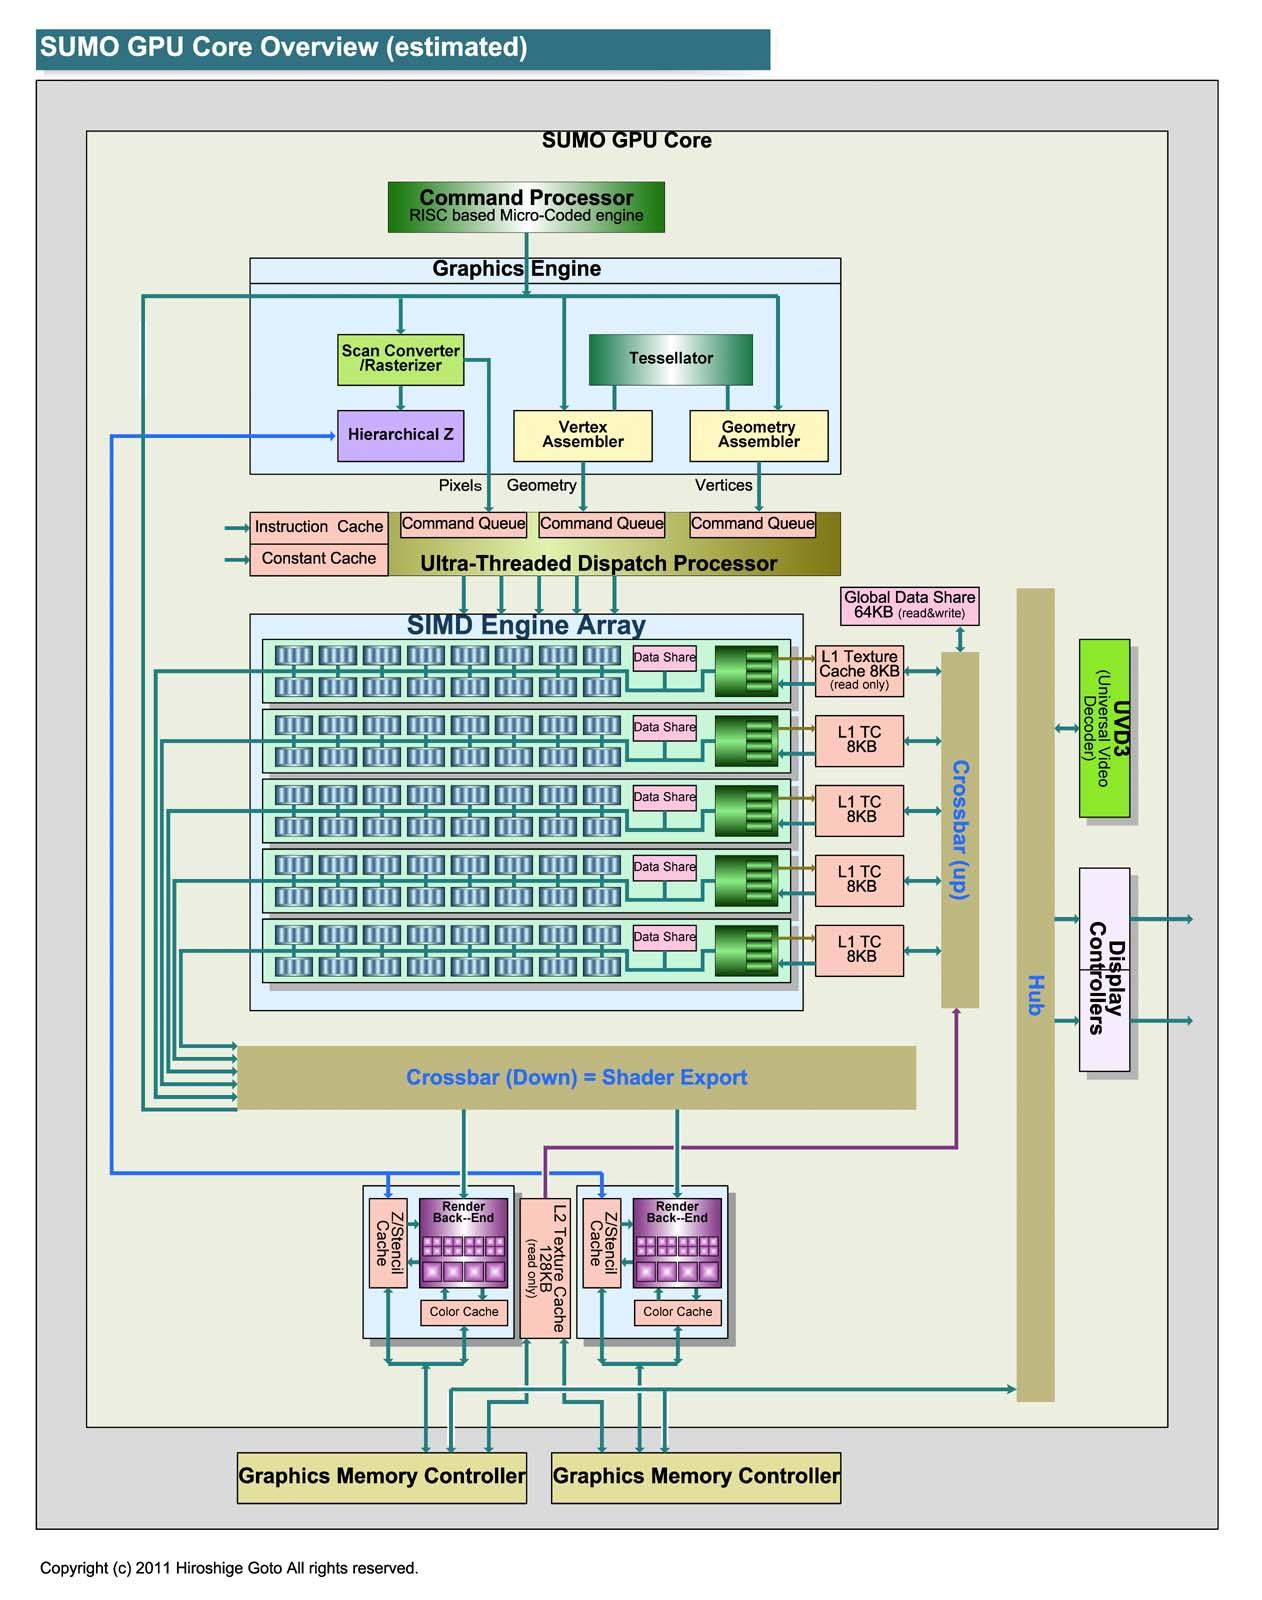 "SUMOの概要(PDF版は<a href=""/video/pcw/docs/475/560/p12.pdf"">こちら</a>)"